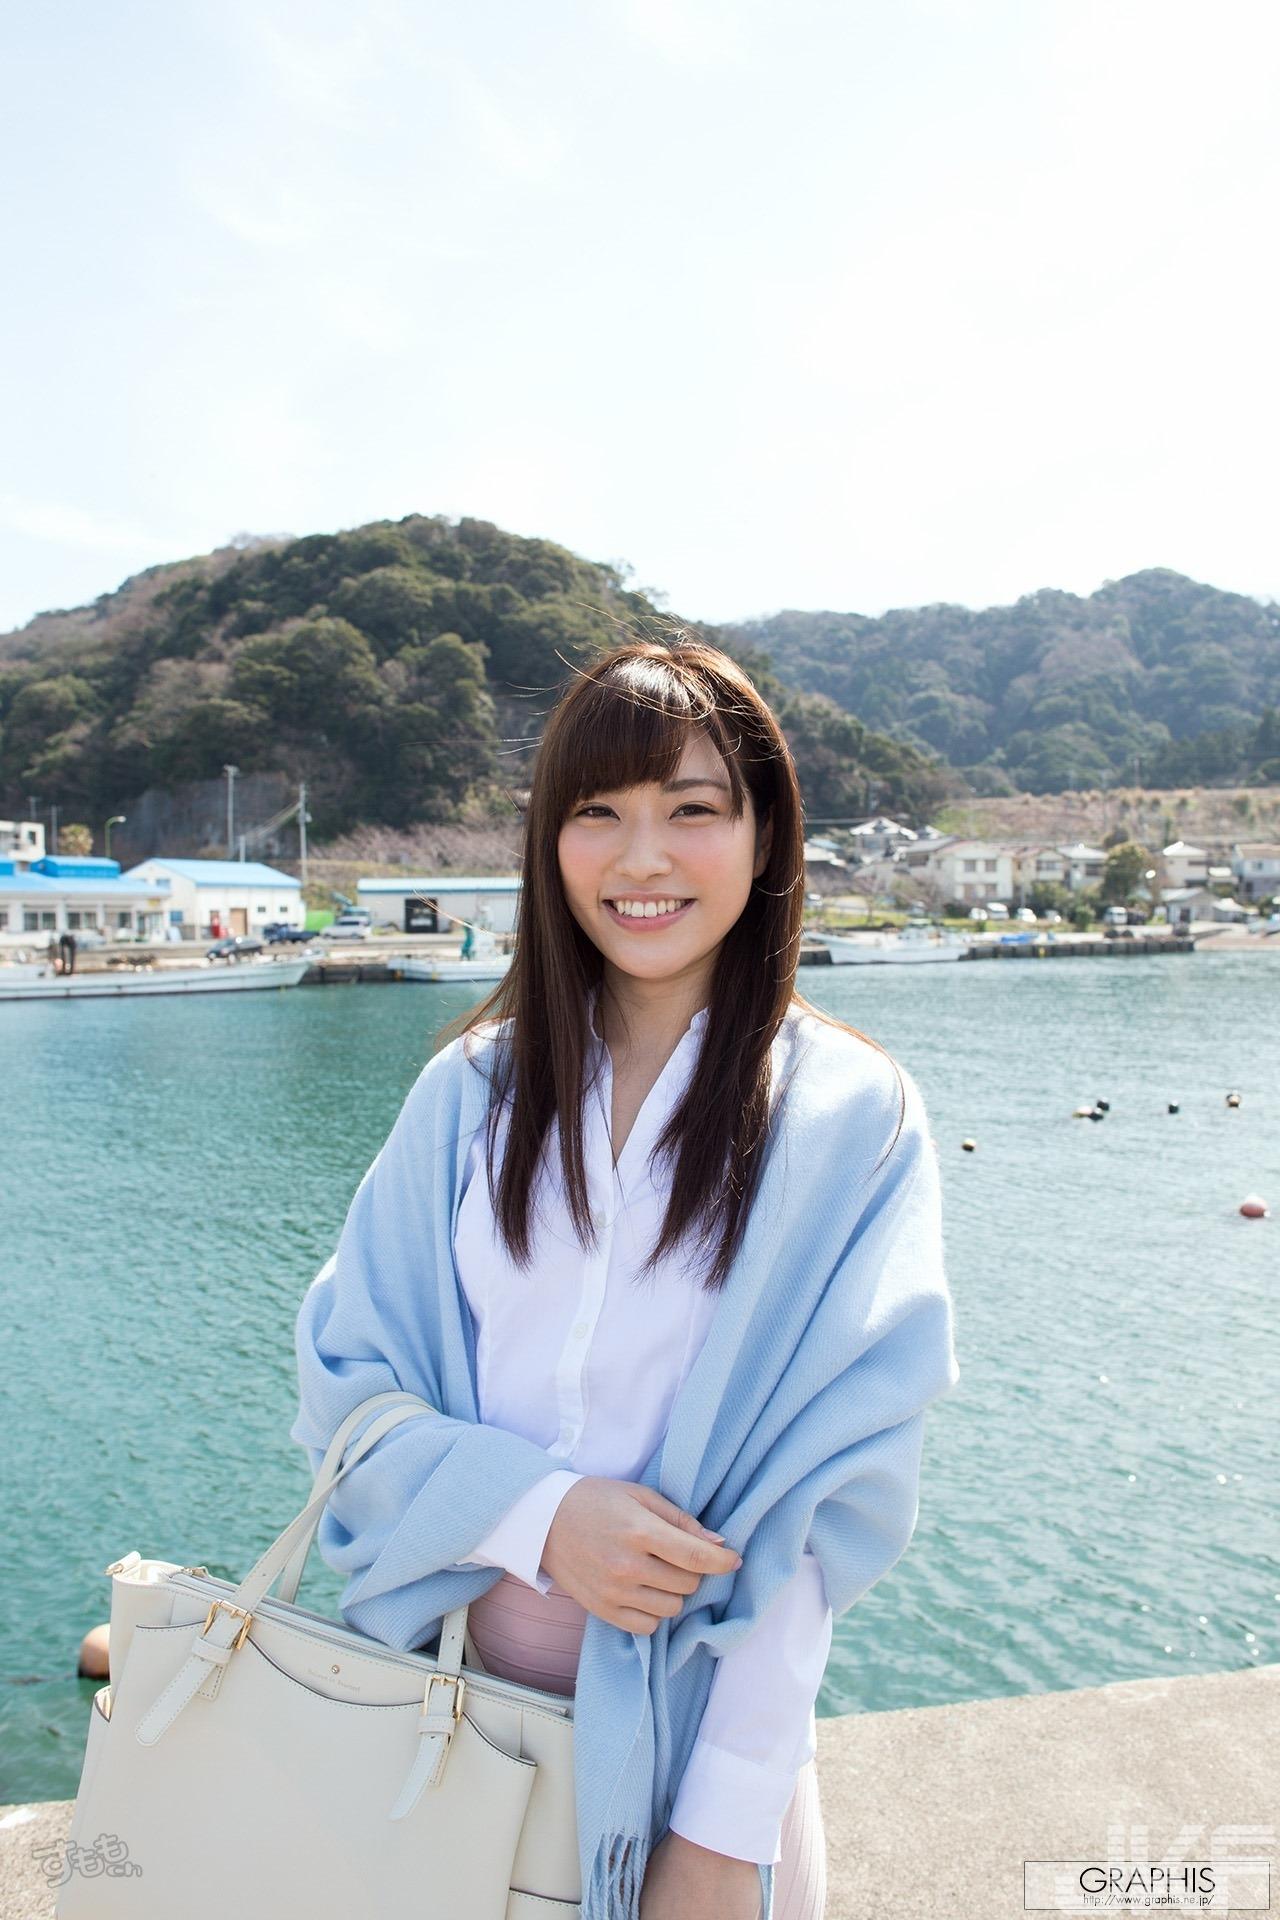 ichikawa_masami_5017-001.jpg